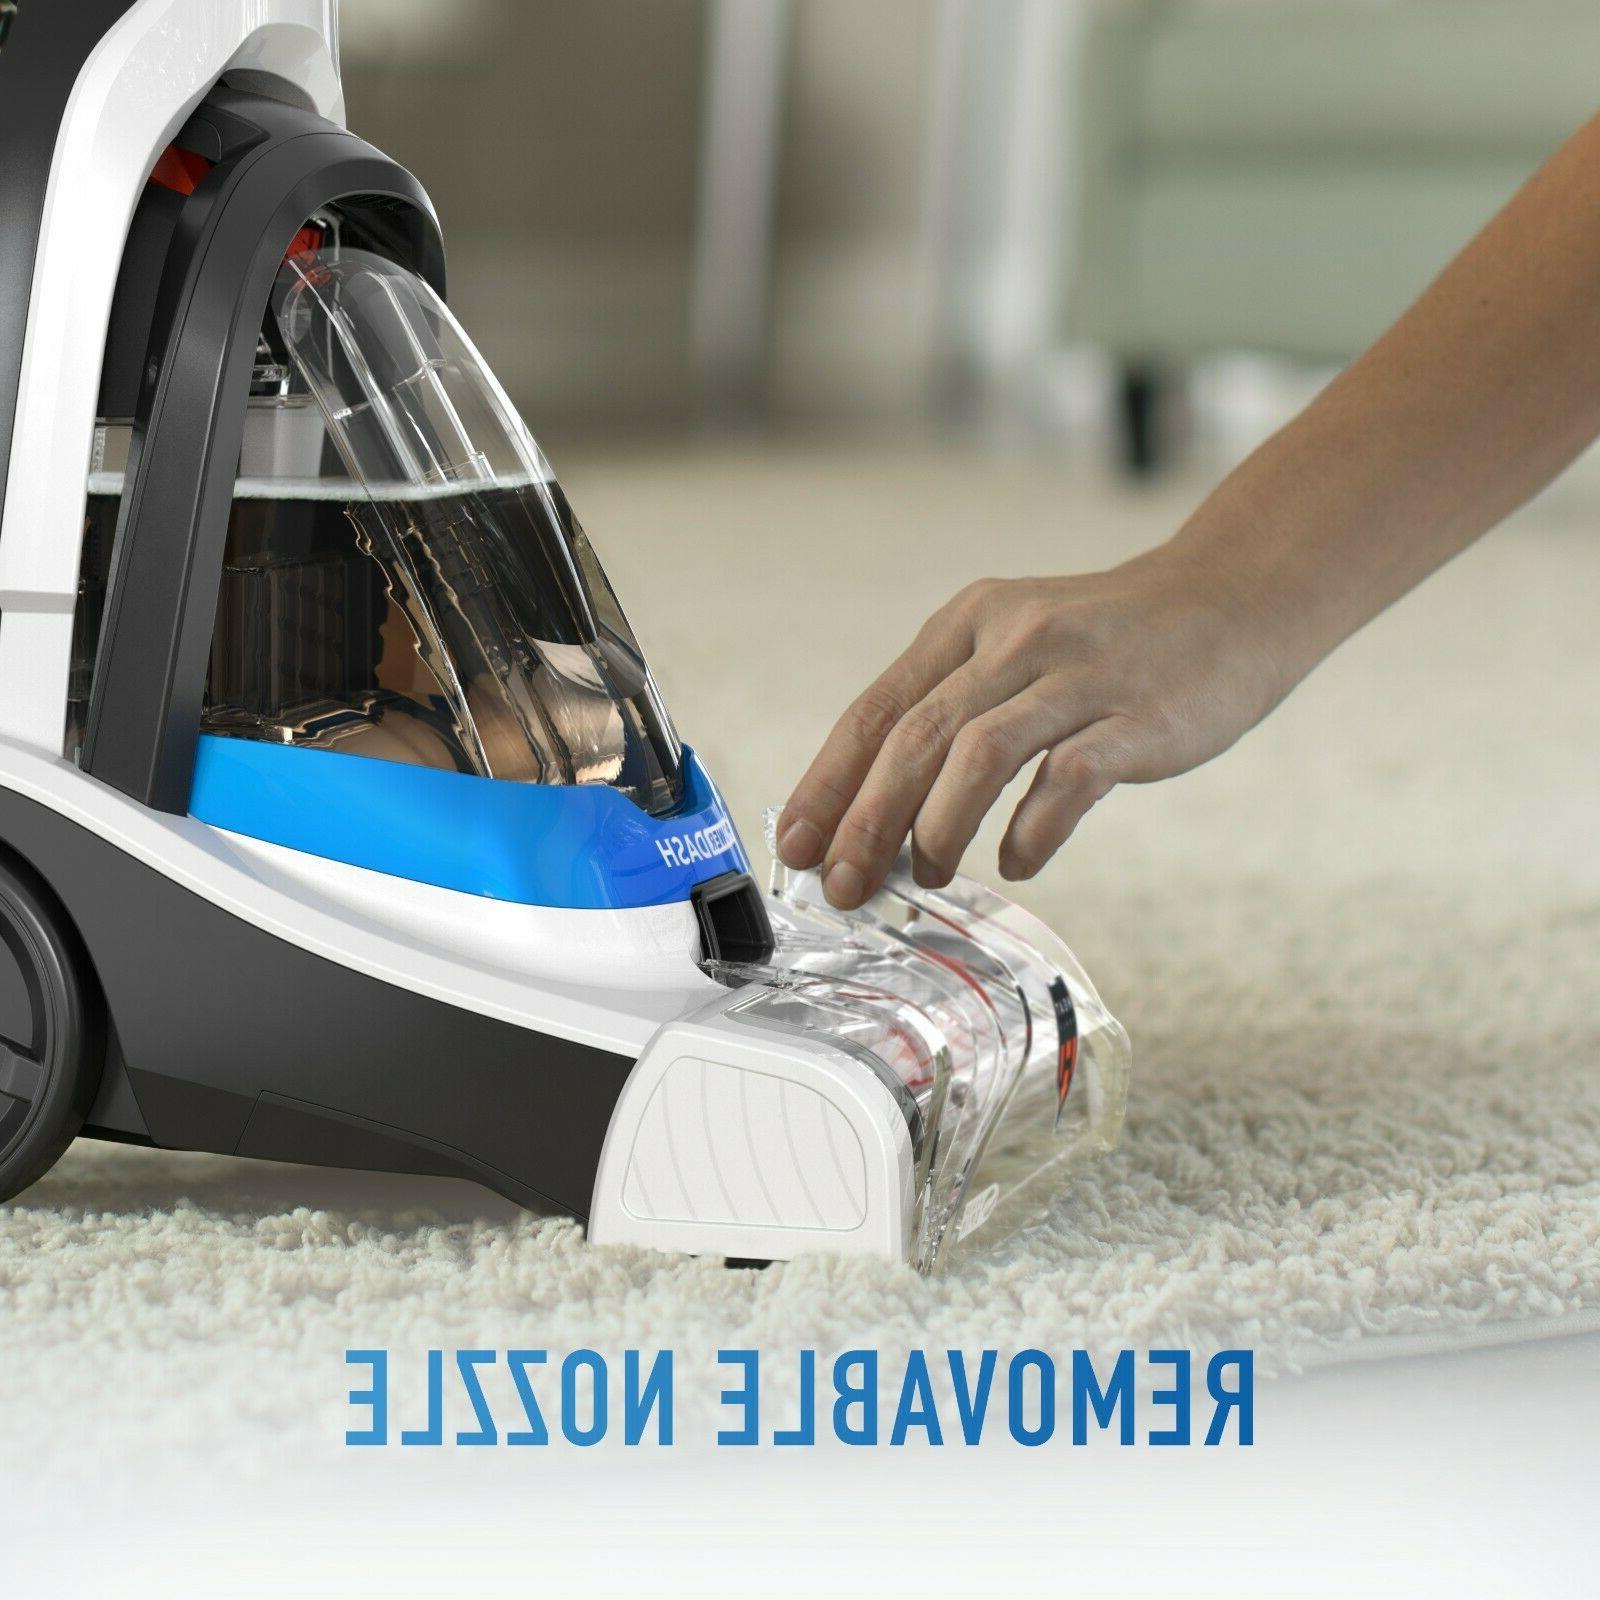 Hoover PowerDash Carpet Cleaner